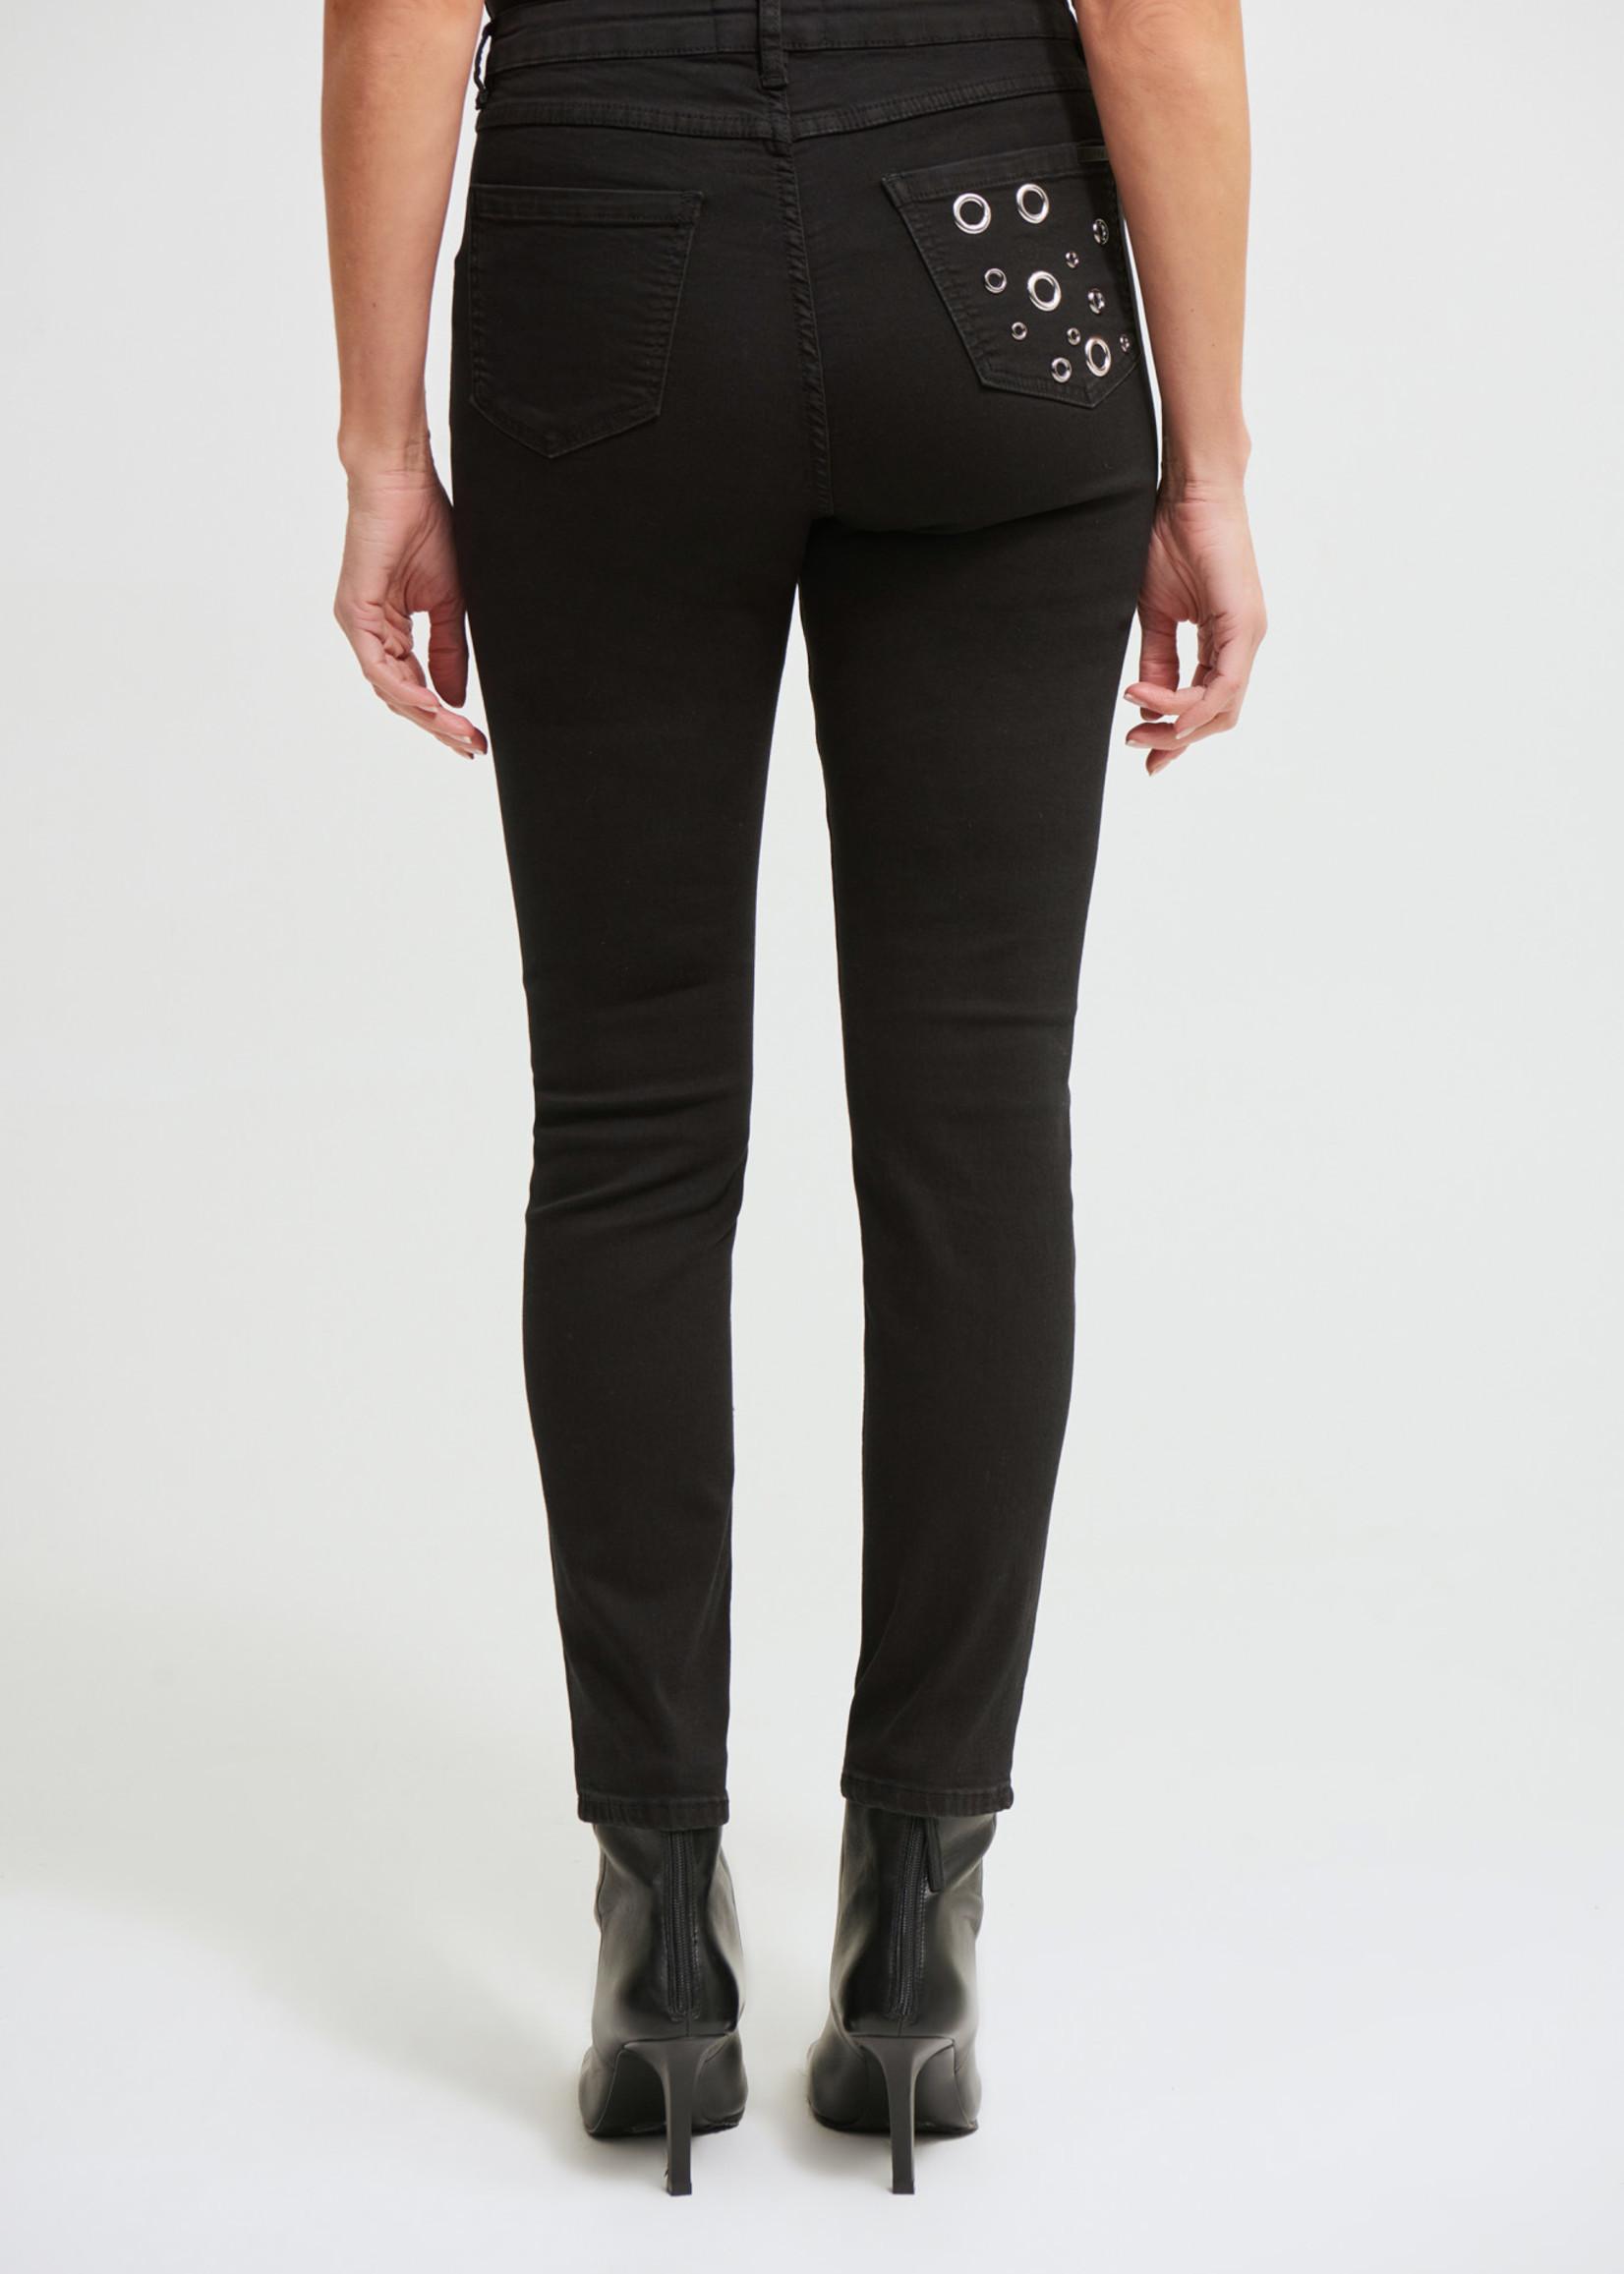 Joseph Ribkoff Joseph Ribkoff Jeans with Grommets